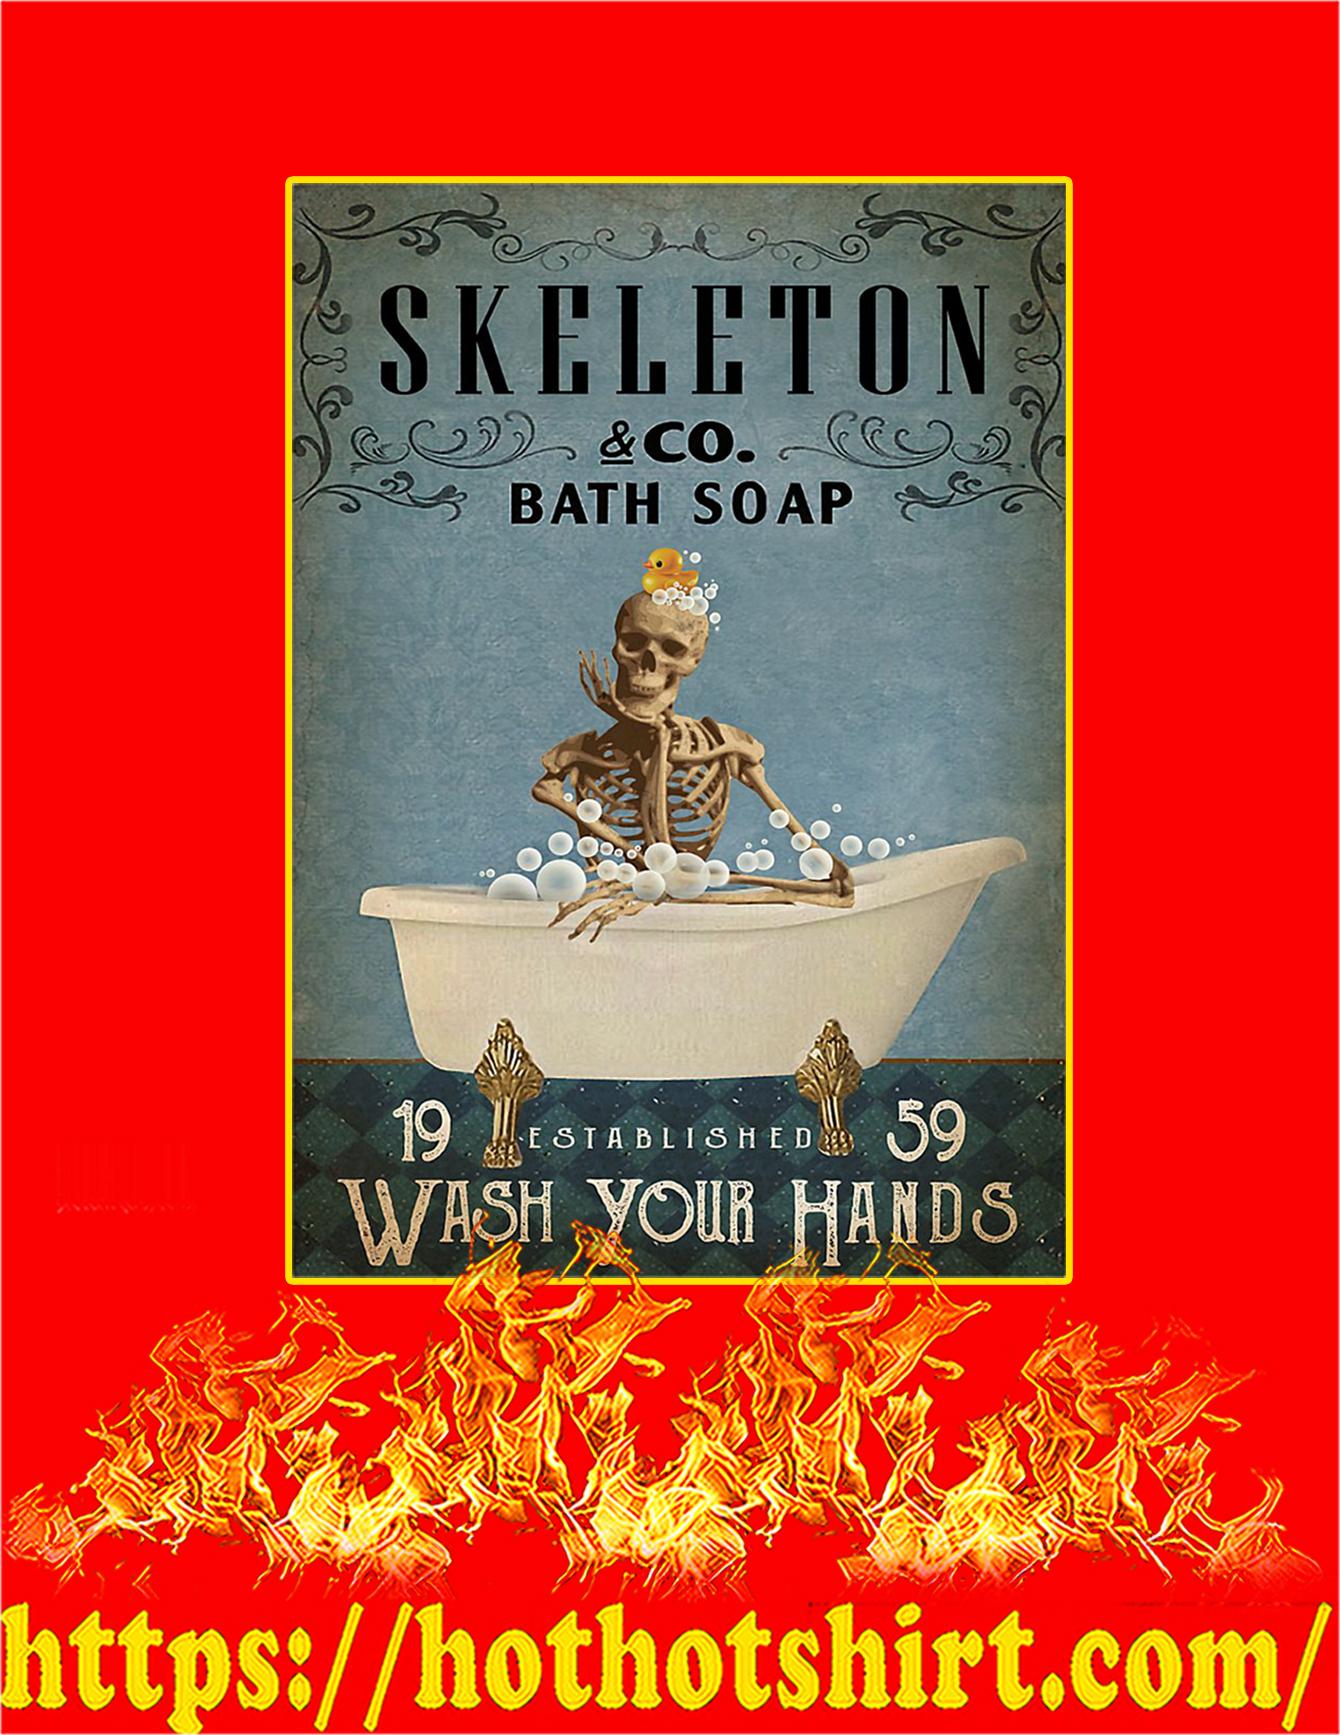 Skeleton Co Bath Soap Wash Your Hands Poster - A3